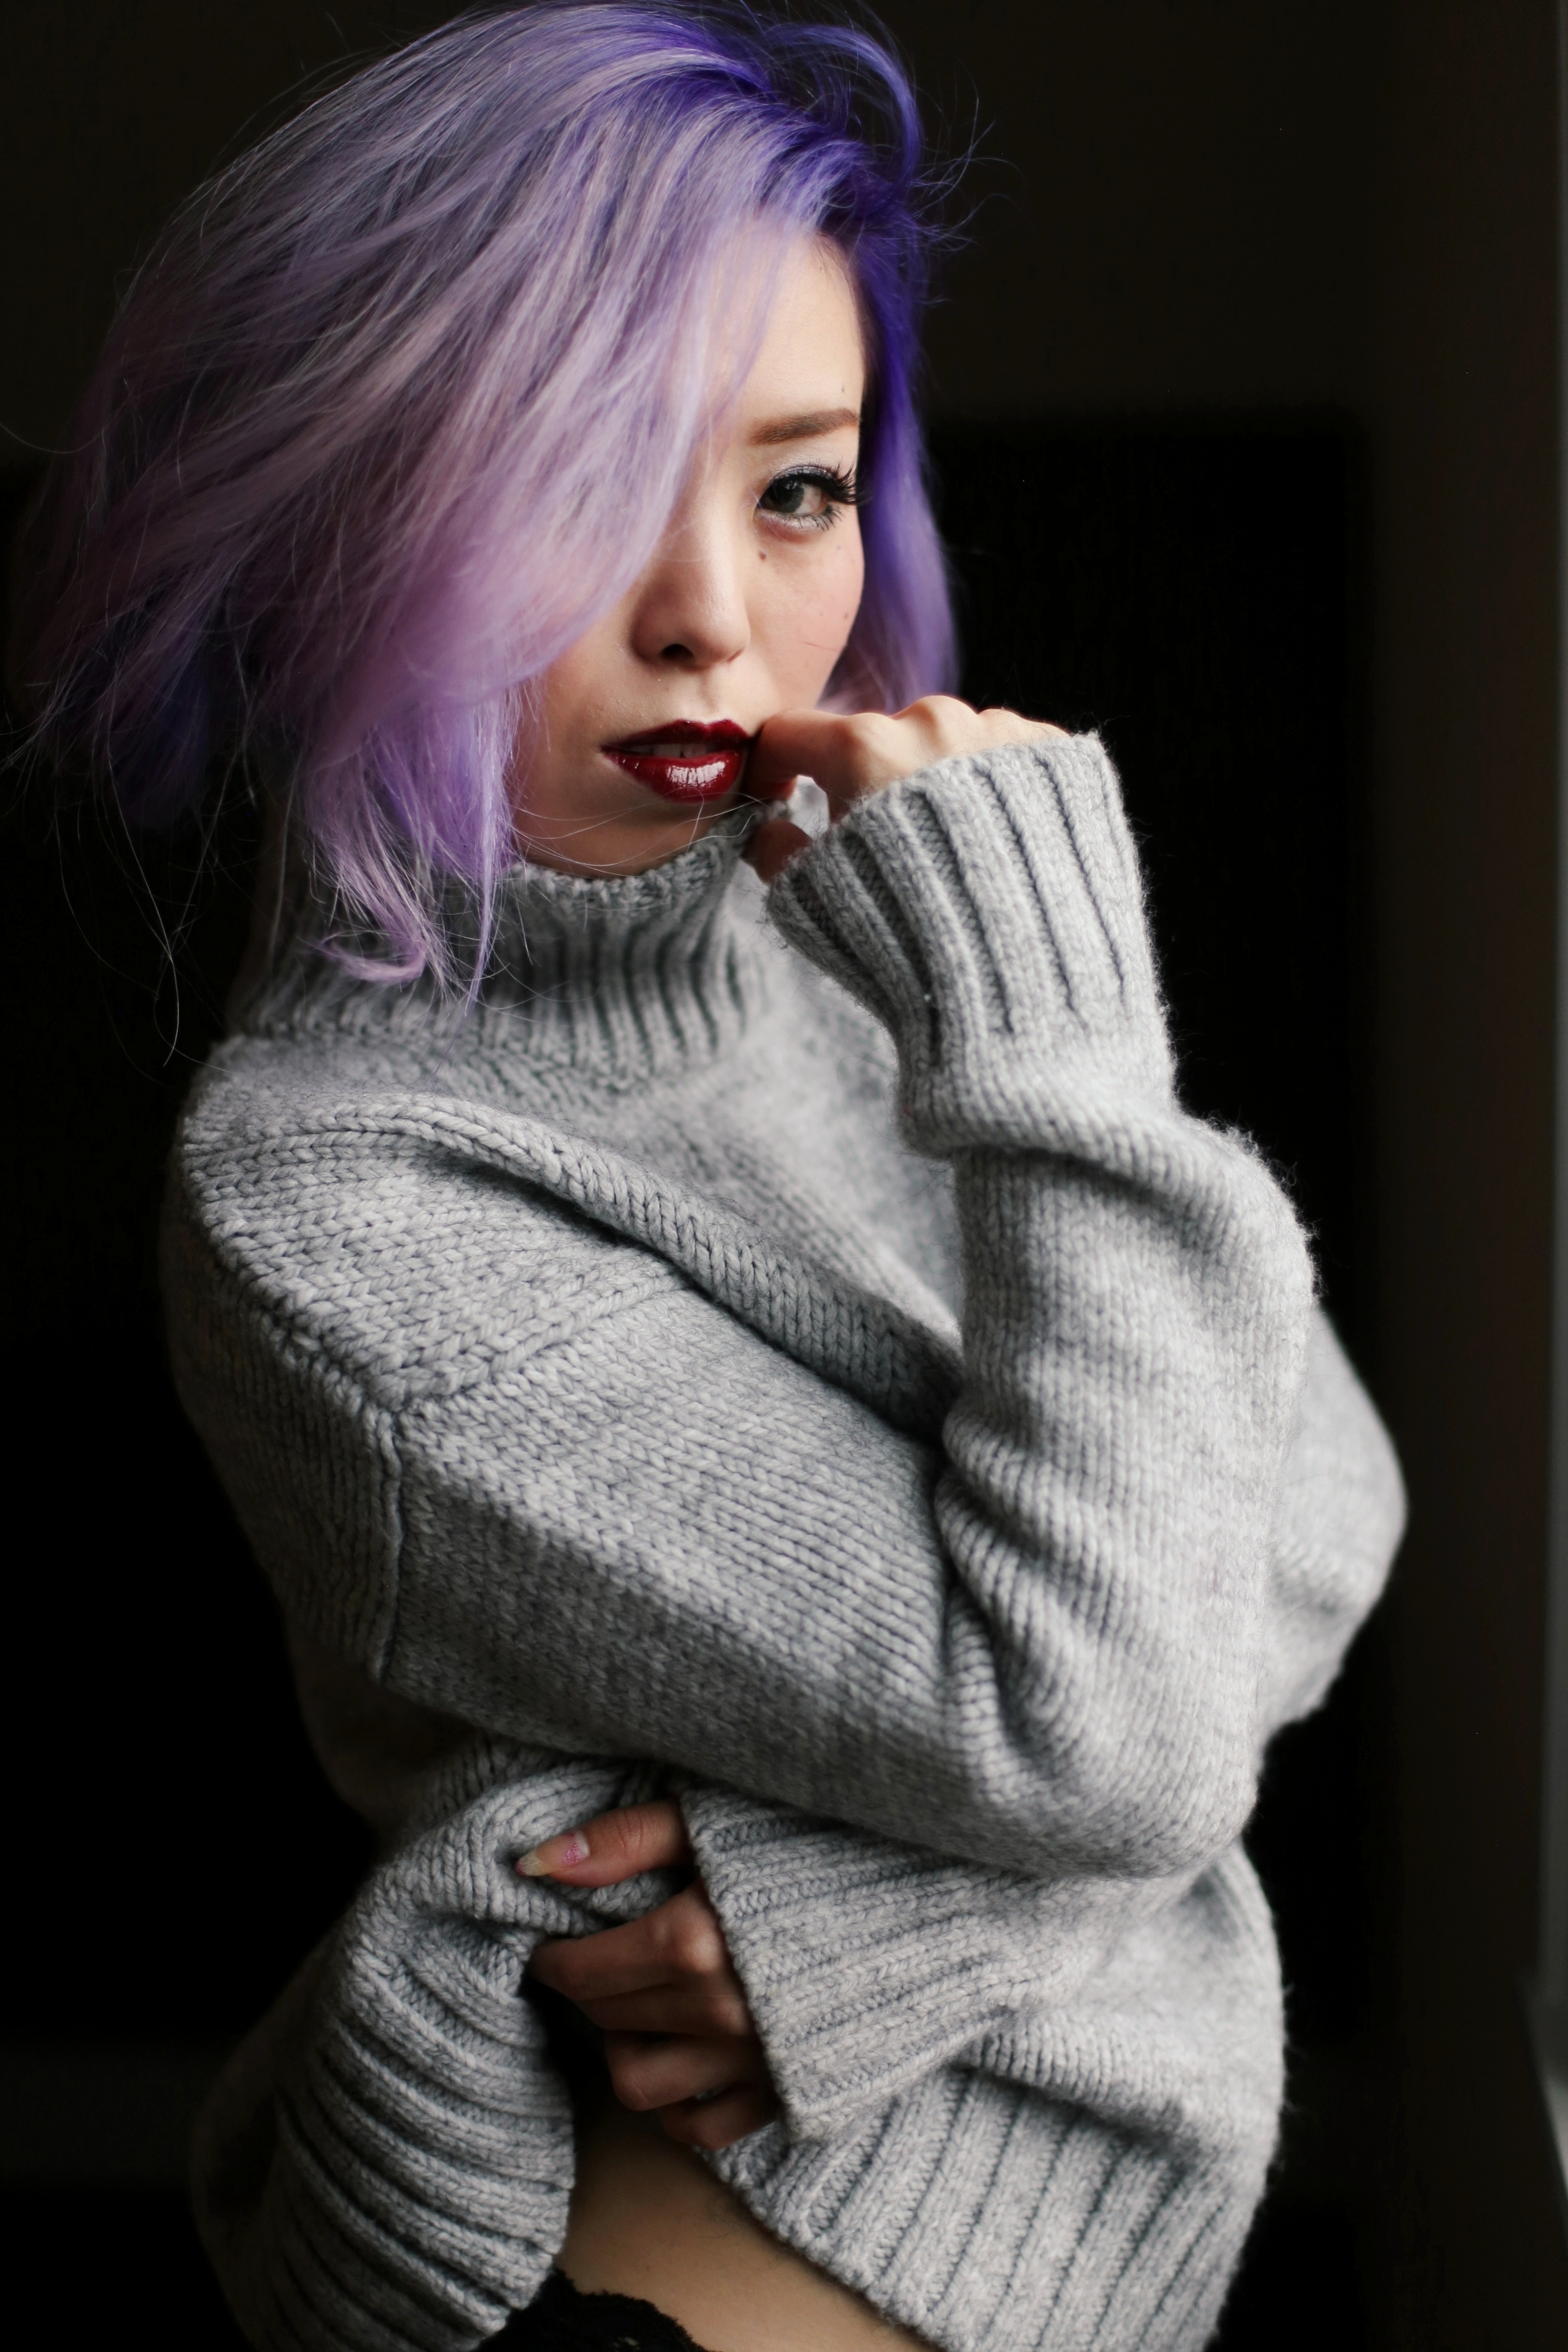 Boudoir Photo-black and white photography-sweater weather-turtle neck sweater-black lingerie-dark lipstick-japanese-Aika's Love Closet-Seattle model-Seattle Style blogger-Lavender Hair-colored Hair-Mermaid Hair-Zara Sweater 4